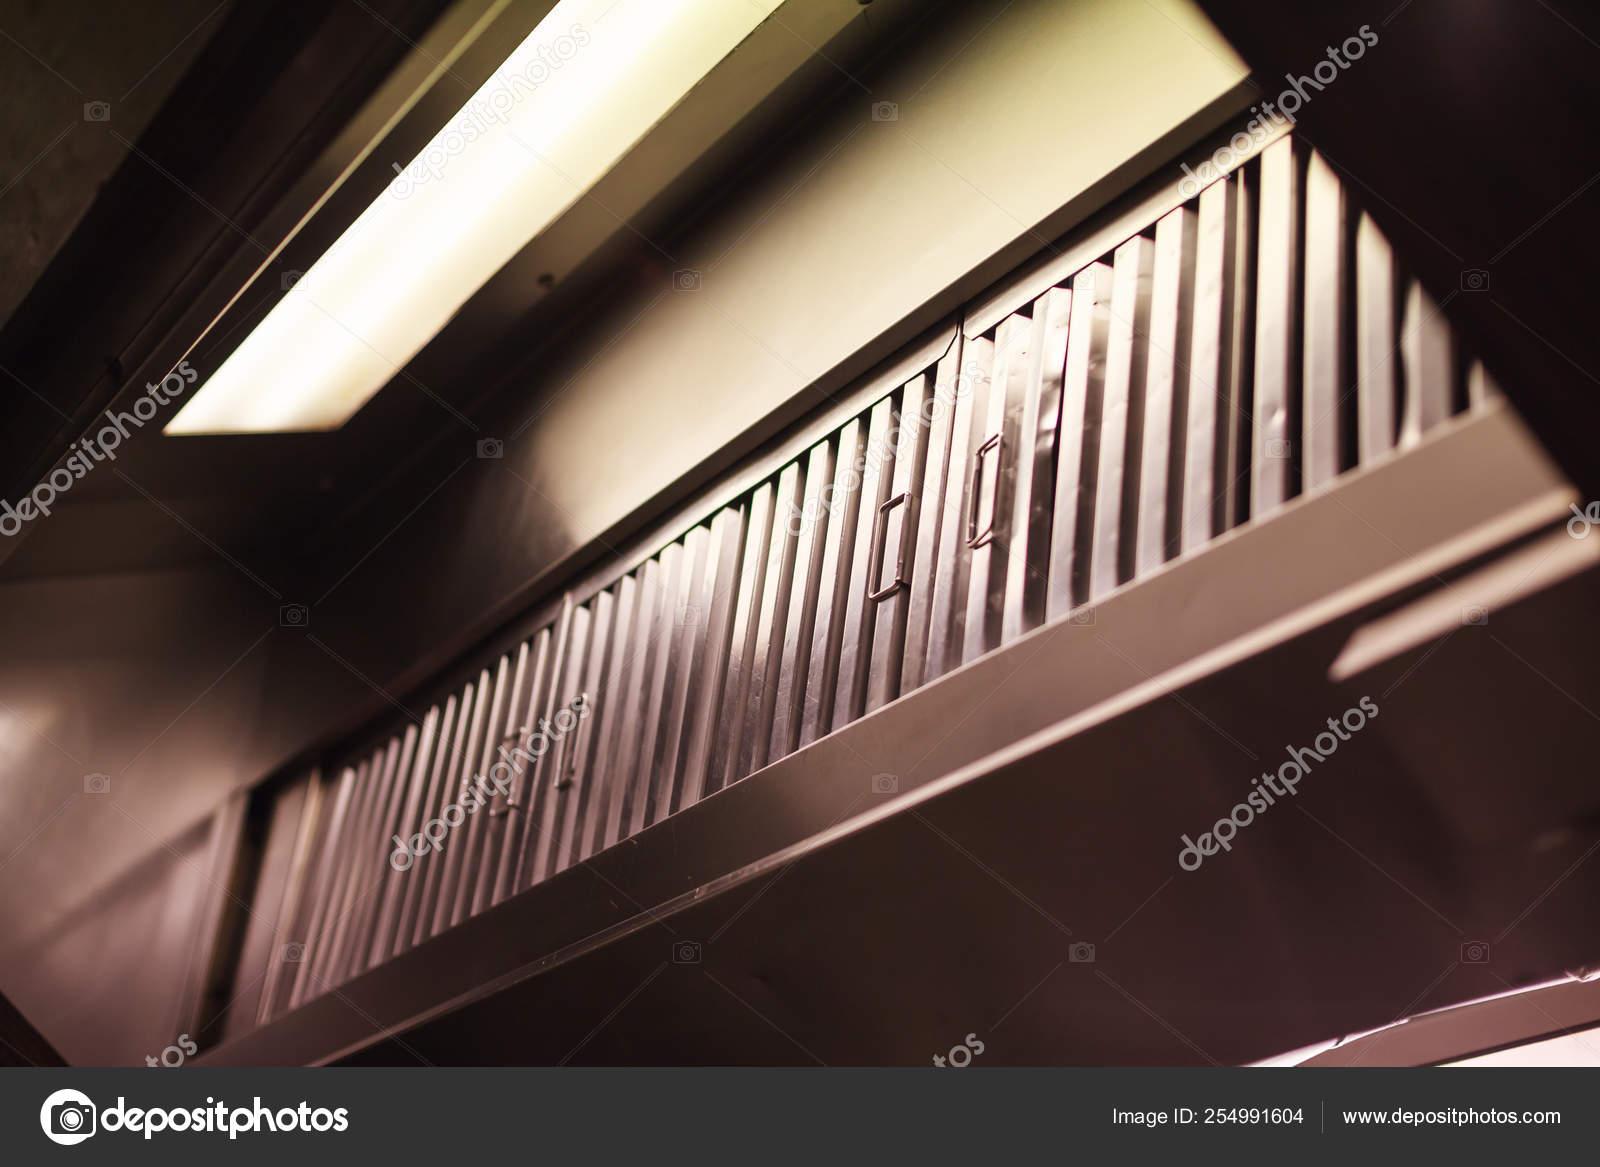 https depositphotos com 254991604 stock photo kitchen hood exhaust hood range html